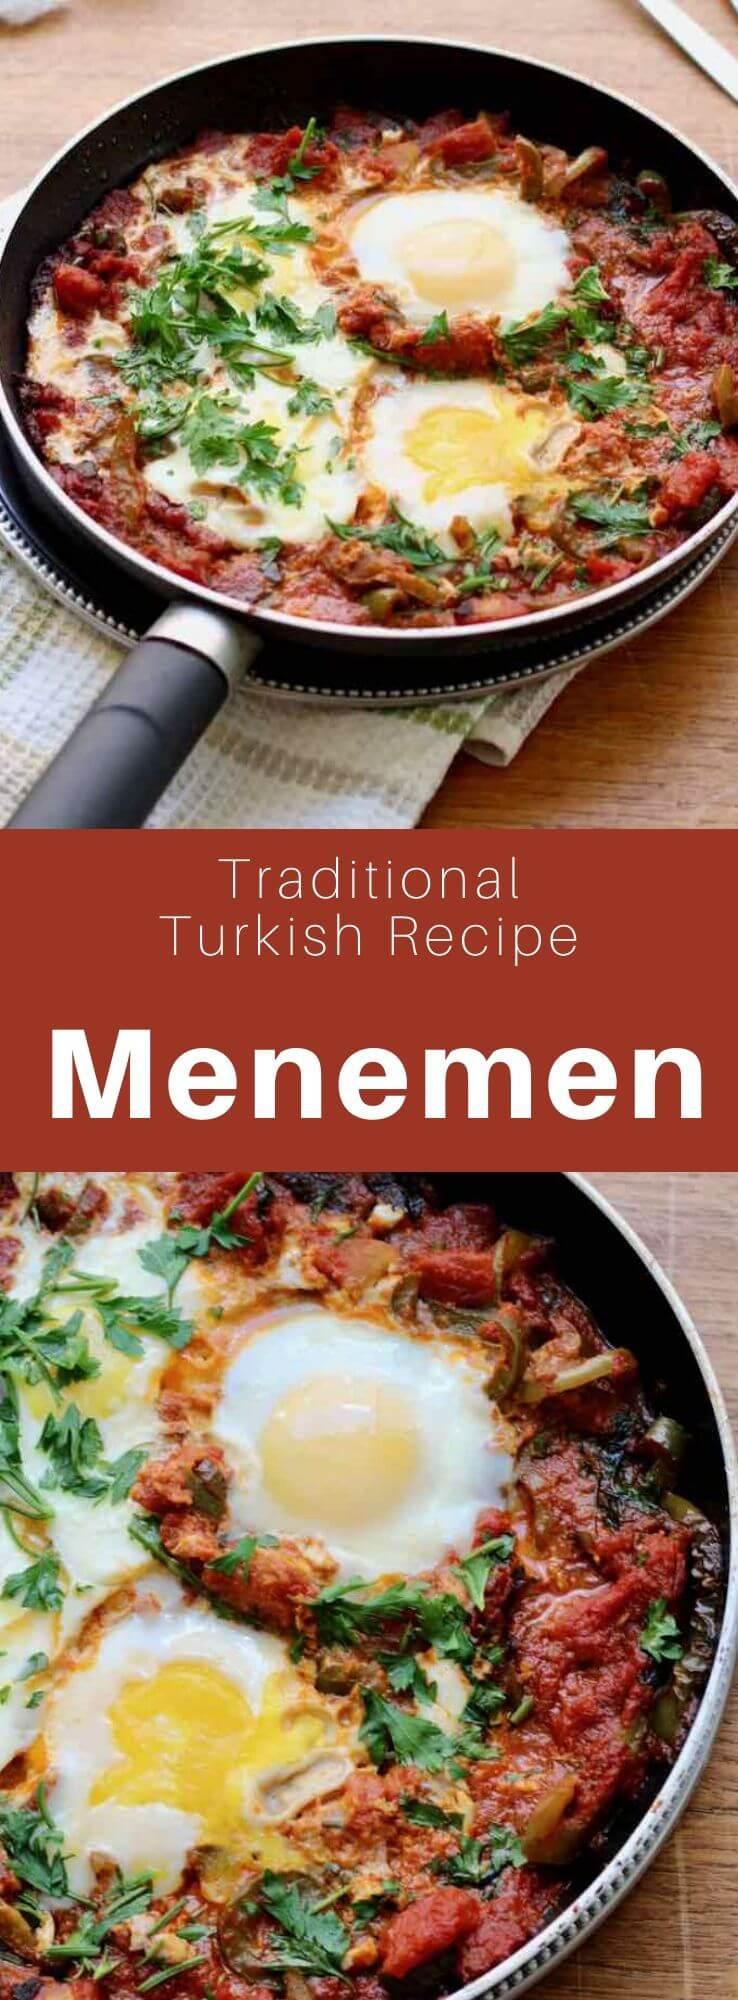 Menemen is a traditional Turkish dish of eggs, tomato, green pepper, and onion cooked in olive oil. It is similar to shakshuka. #Turkey #Turkish #TurkishRecipe #TurkishFood #TurkishCuisine #WorldCuisine #196flavors